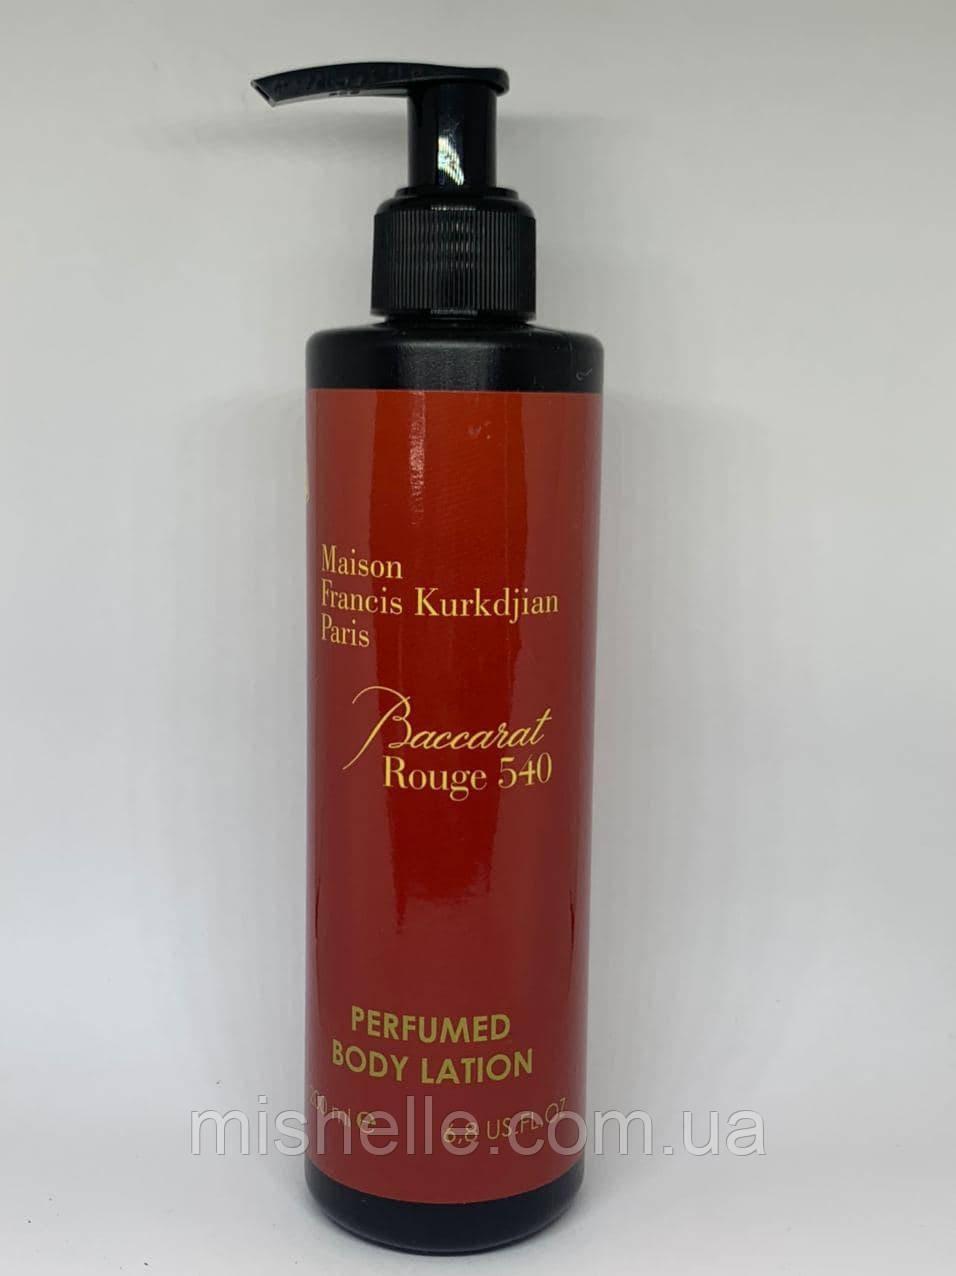 Лосьйон для тіла Maison Francis Kurkdjian Baccarat Rouge 540 Extrait de Parfum (Баккара 540 Екстракт парфум)